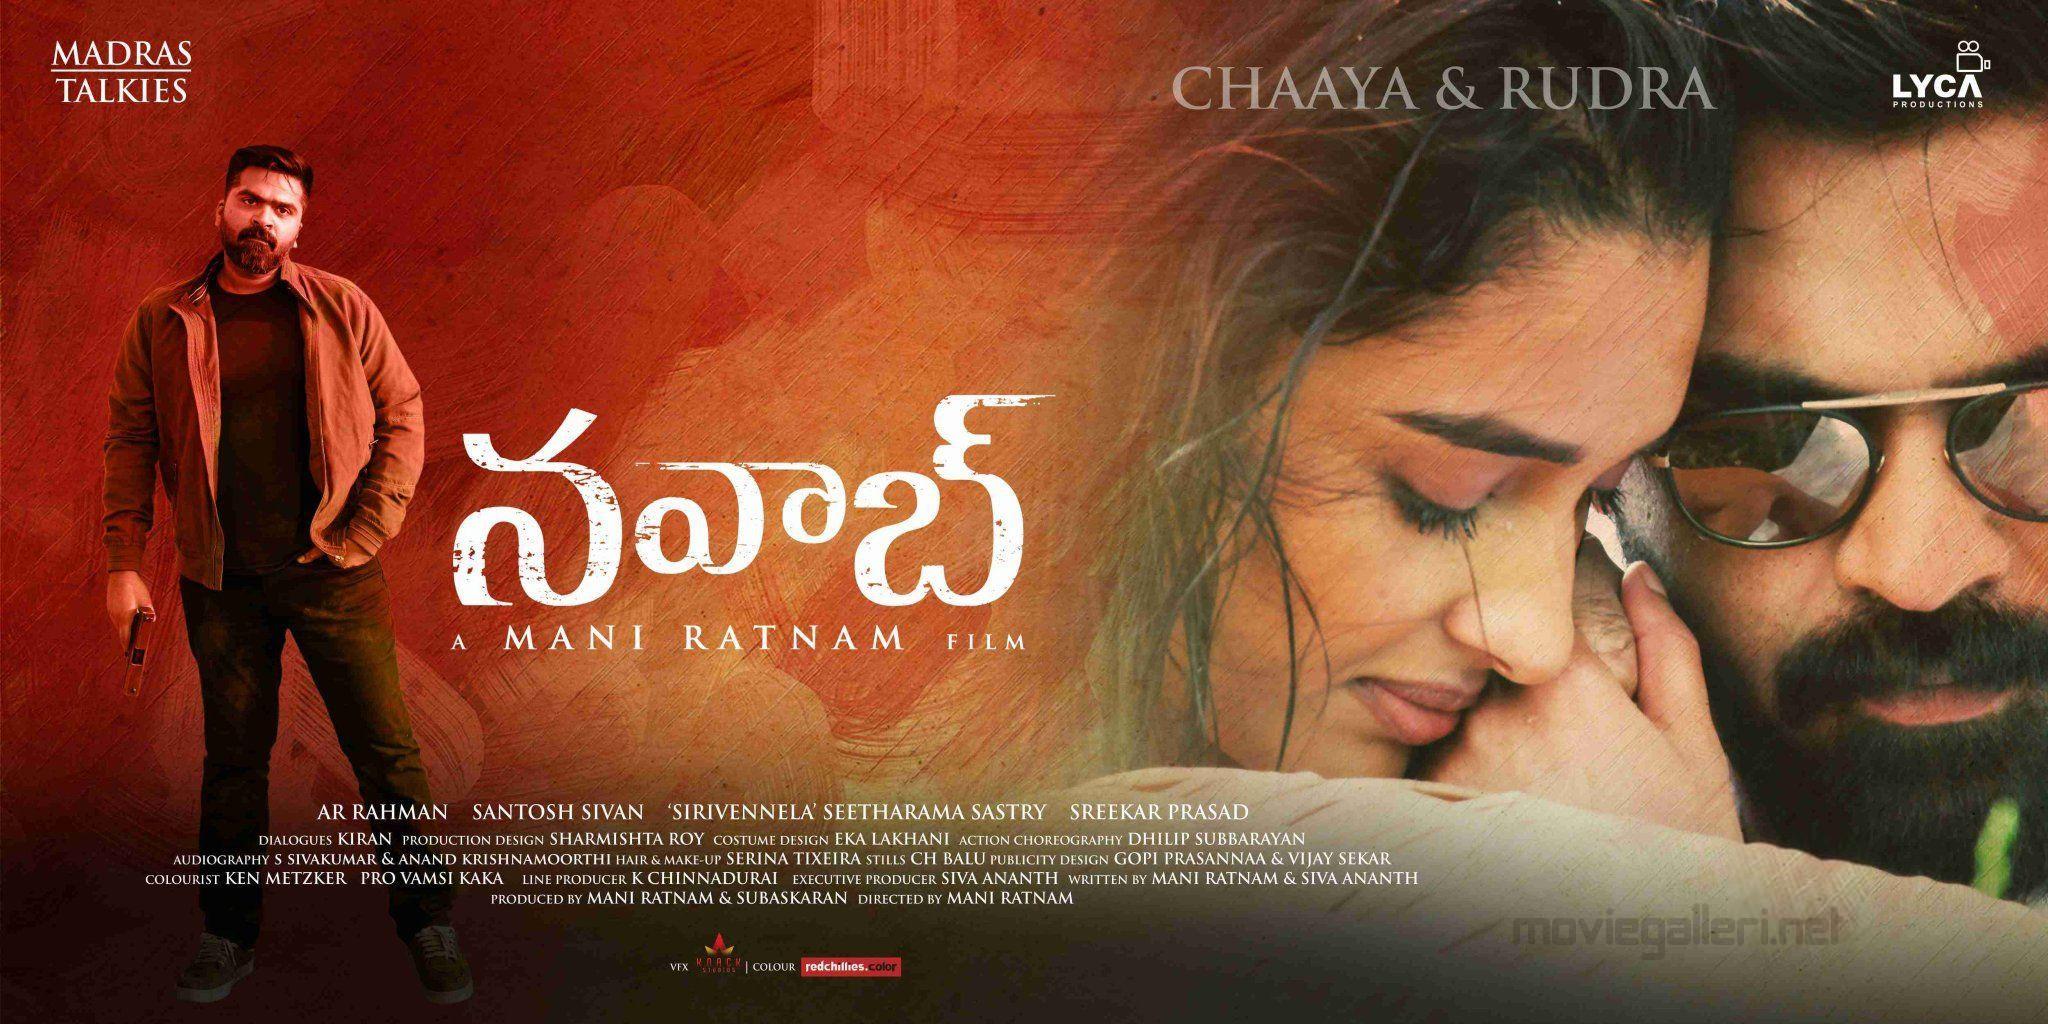 STR, Dayana Erappa in Nawab Movie Poster HD